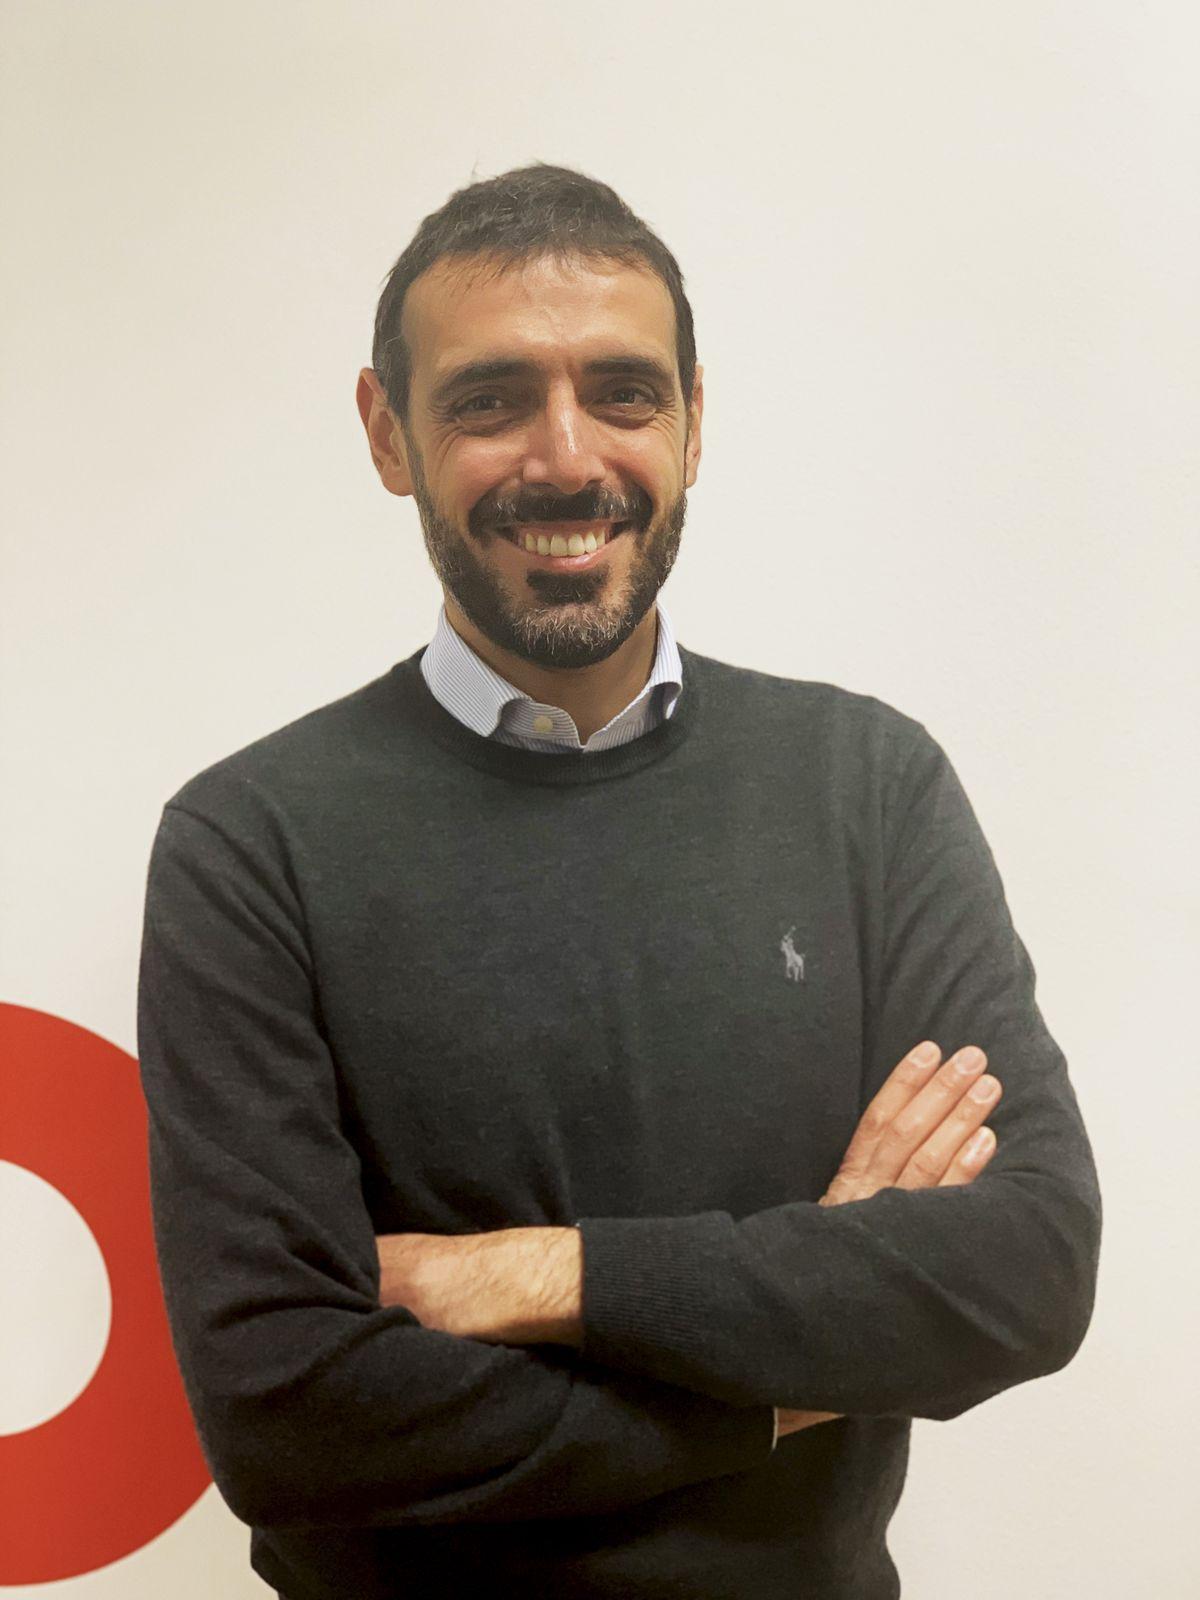 Marco Pesarini